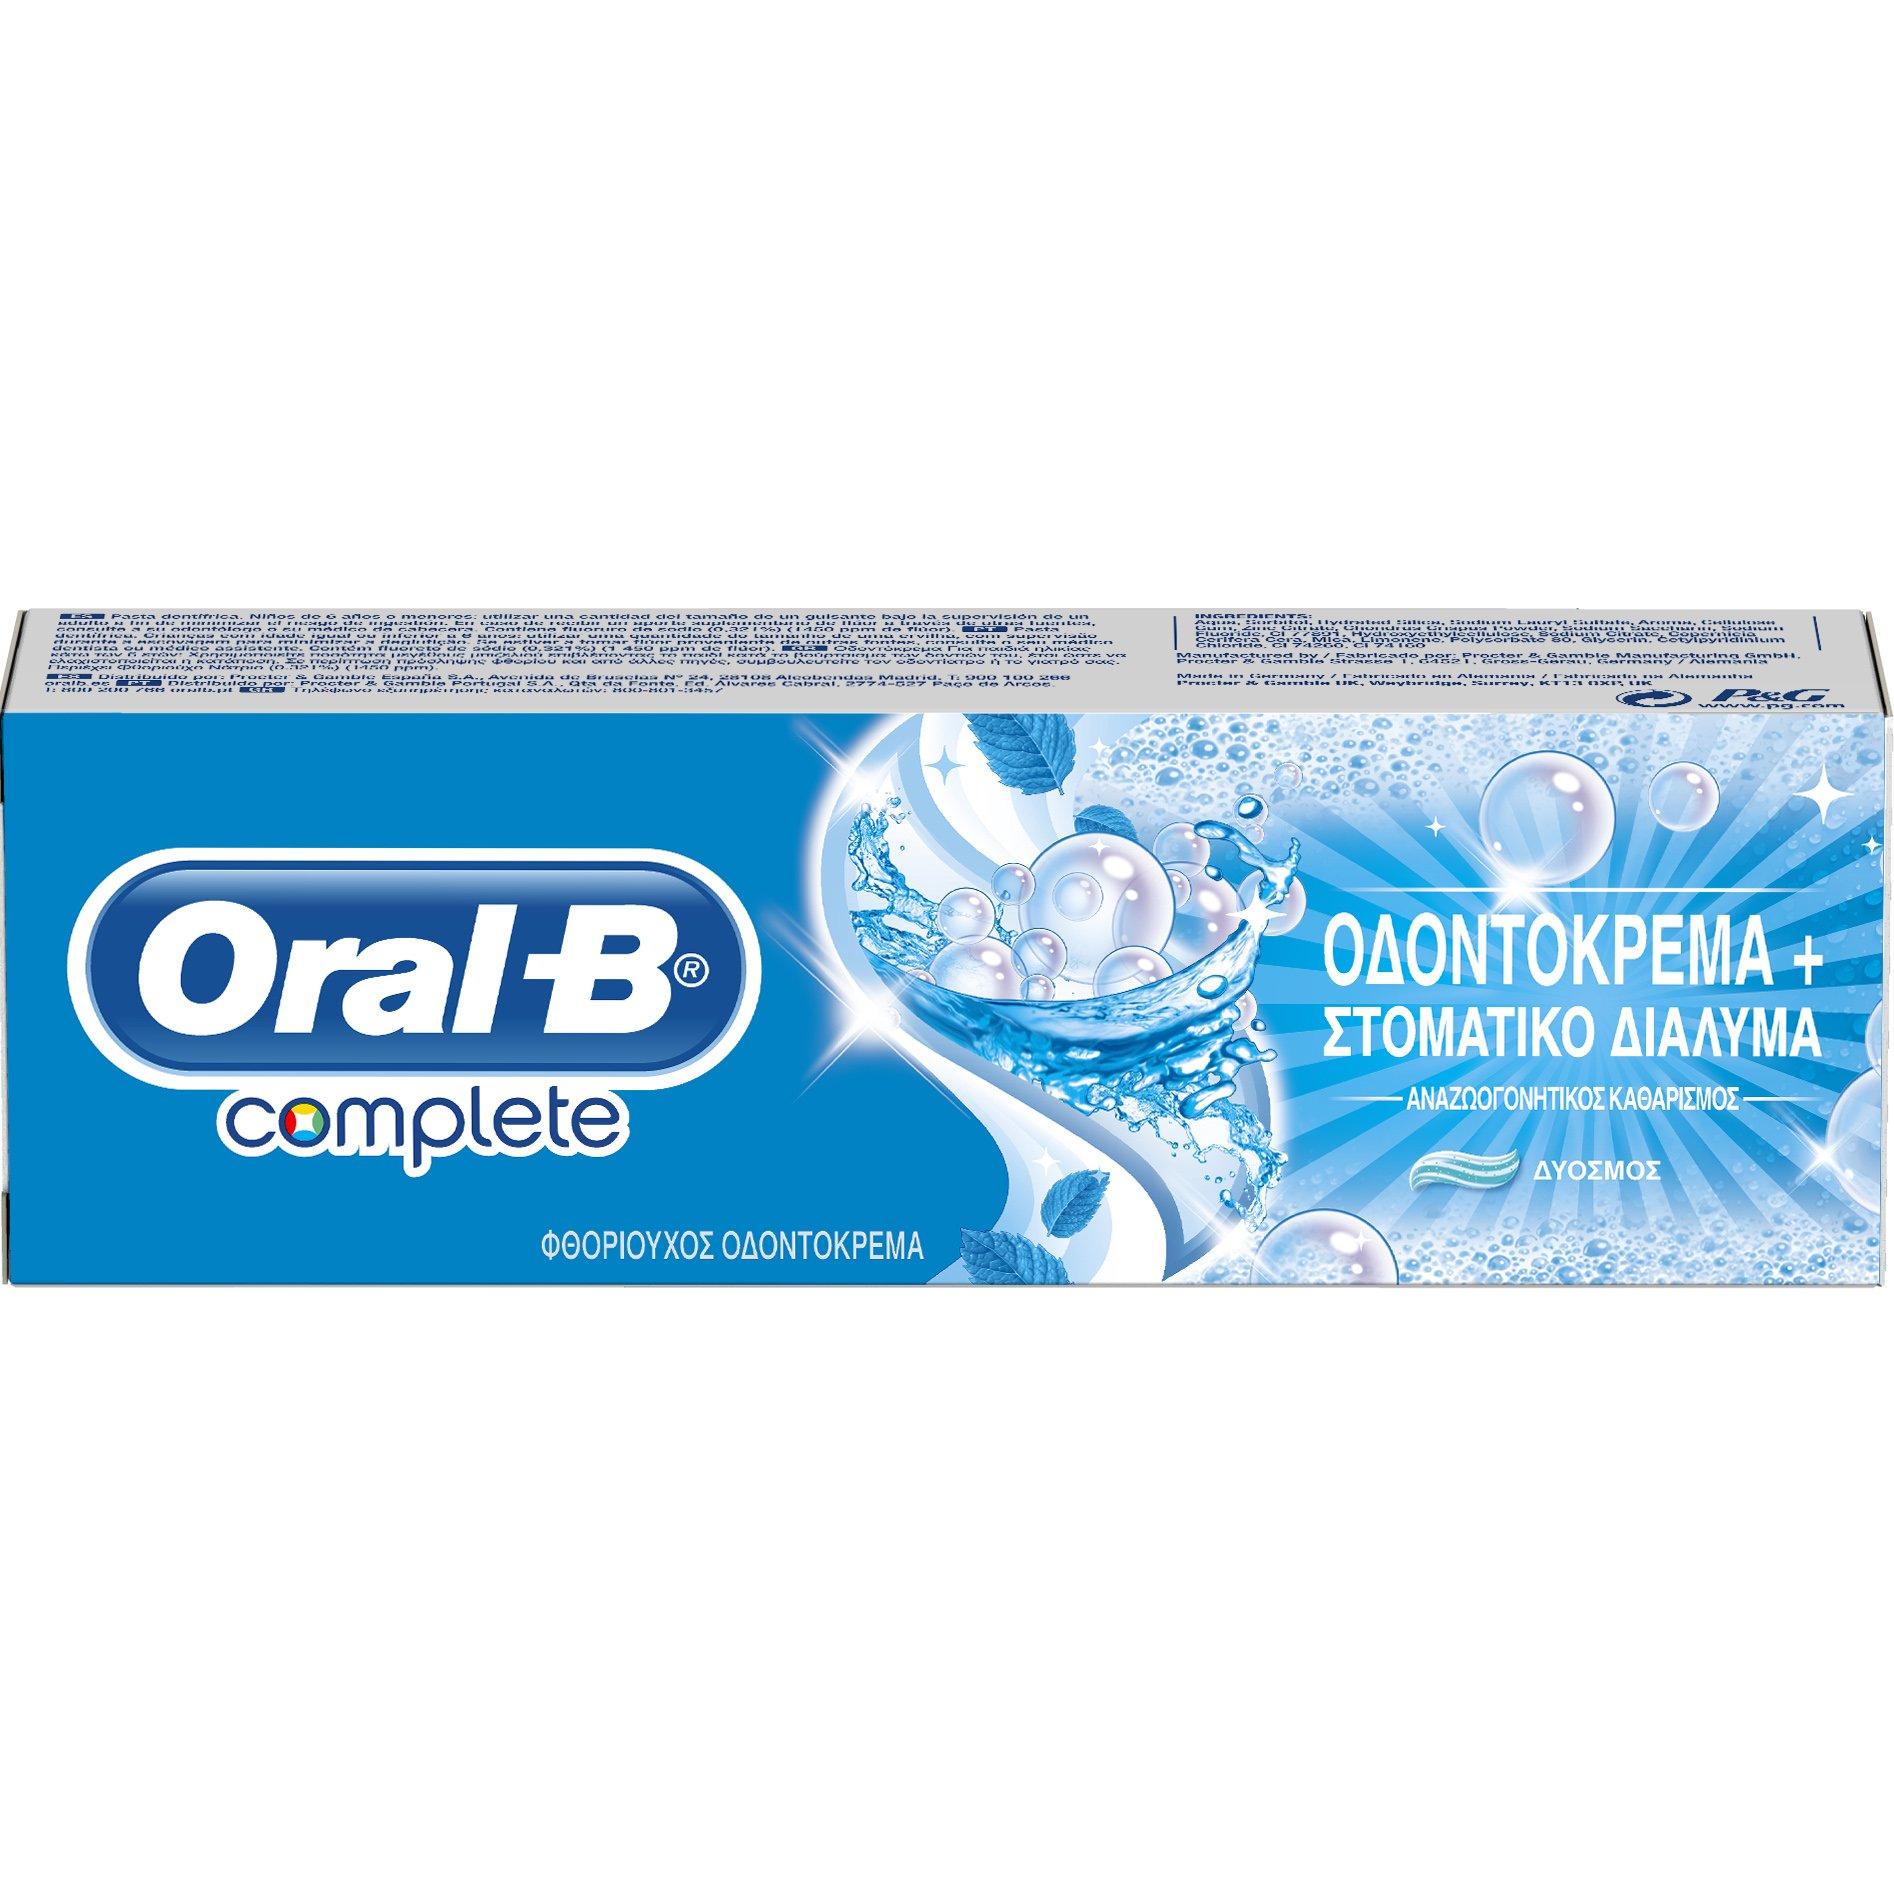 Oral-B Complete Mouth Wash & Whitening Extra Fresh Οδοντόκρεμα για Λεύκανση & Στοματικό Διάλυμα Μαζί 75ml